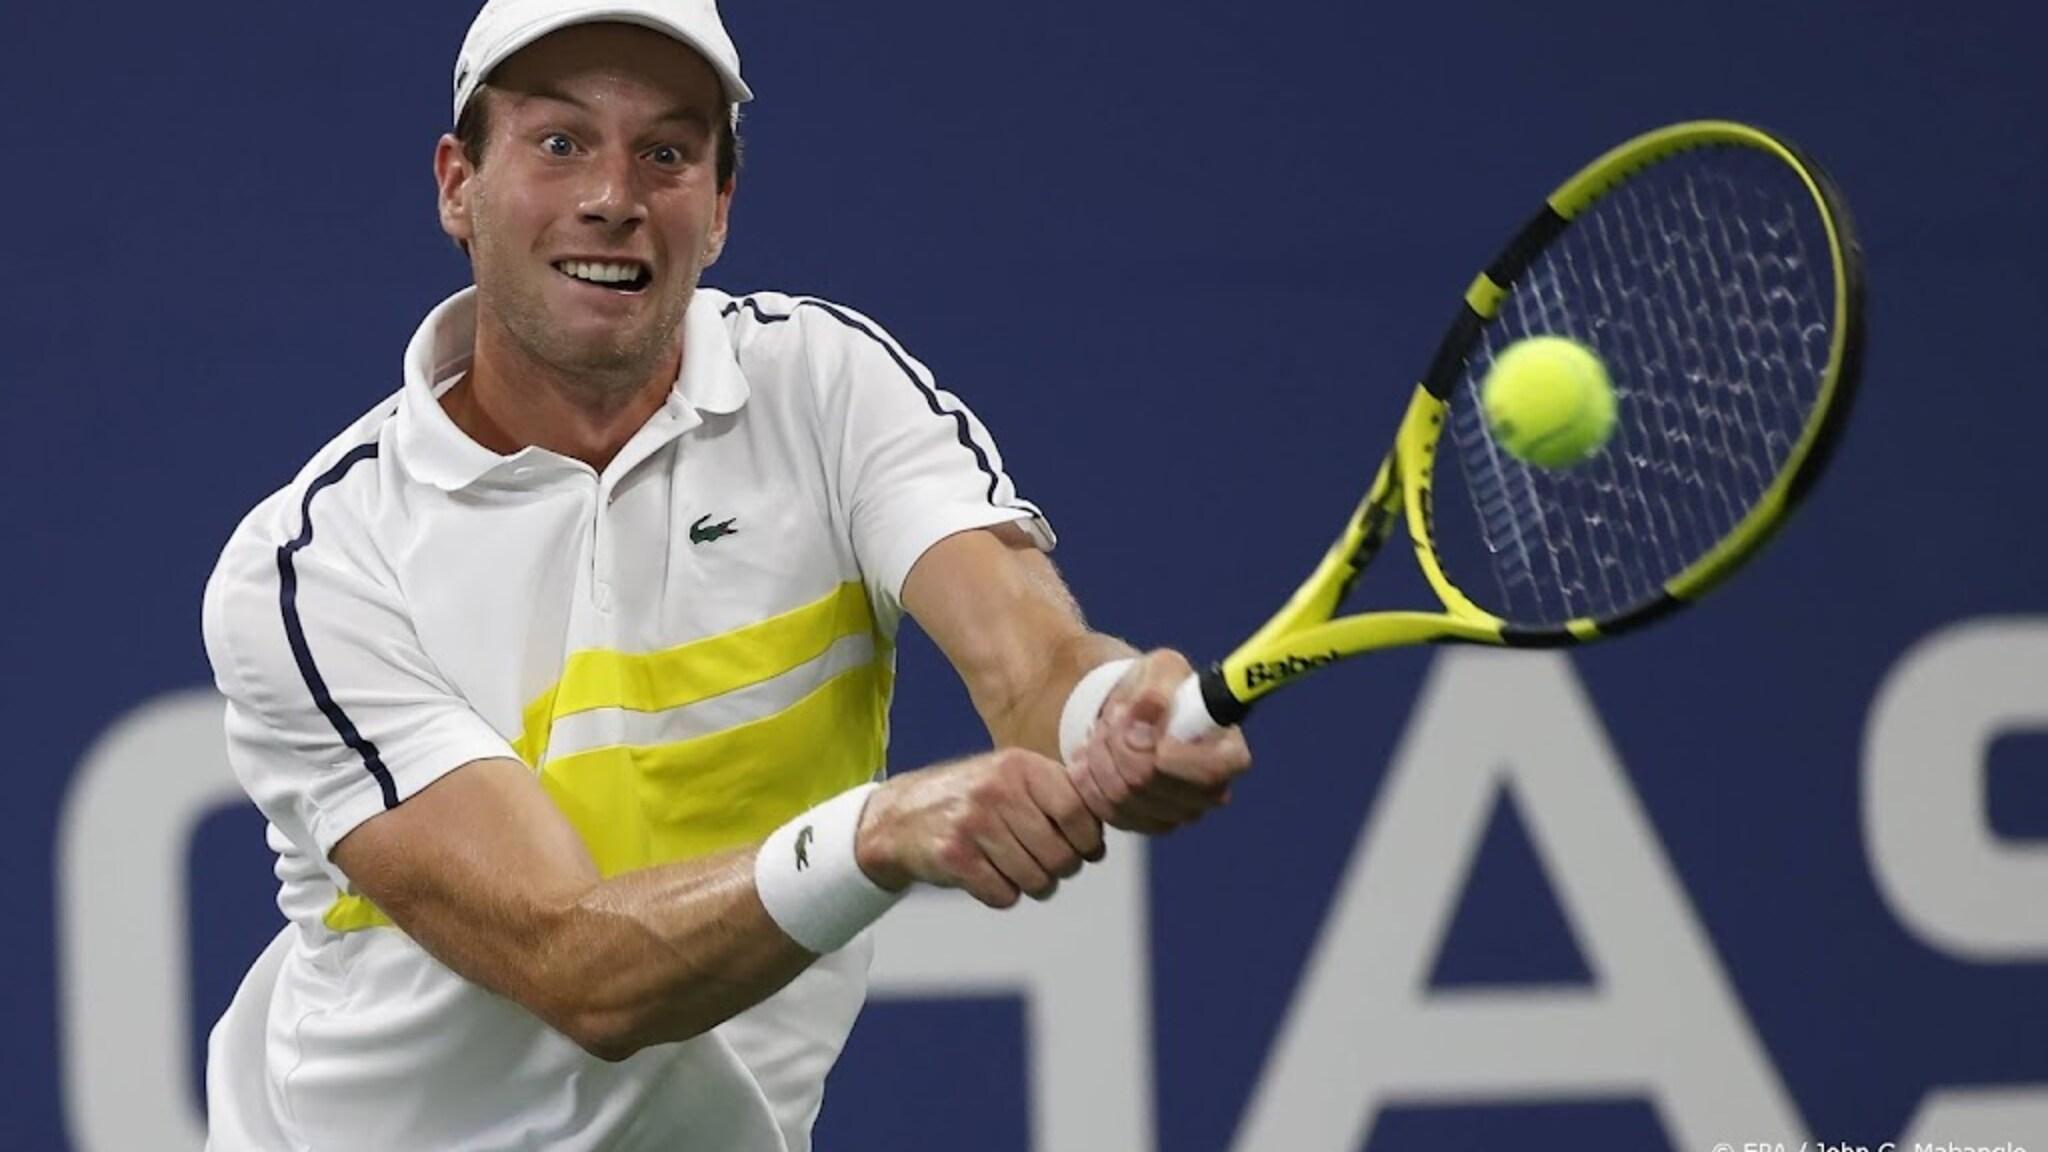 Newcomer Van de Zandschul remains vigilant after winning the US Open